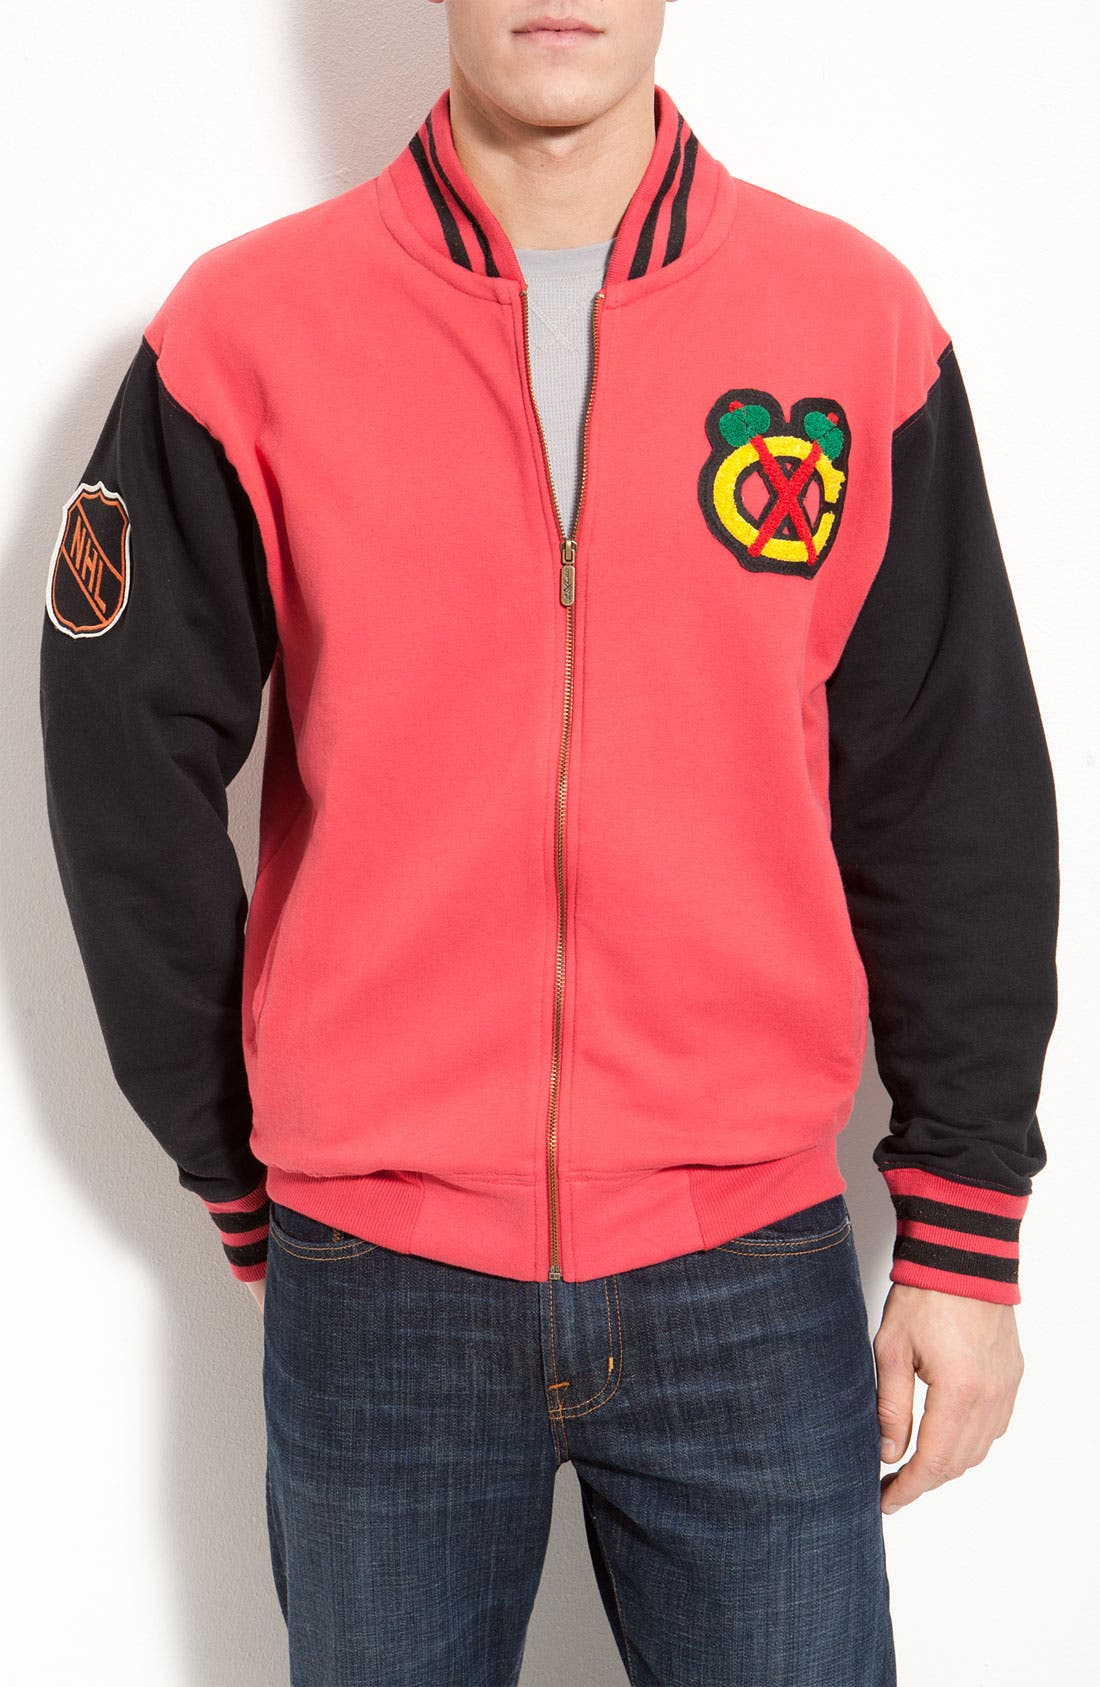 Alternate Image 1 Selected - Red Jacket 'Homeroom Blackhawks' Jacket